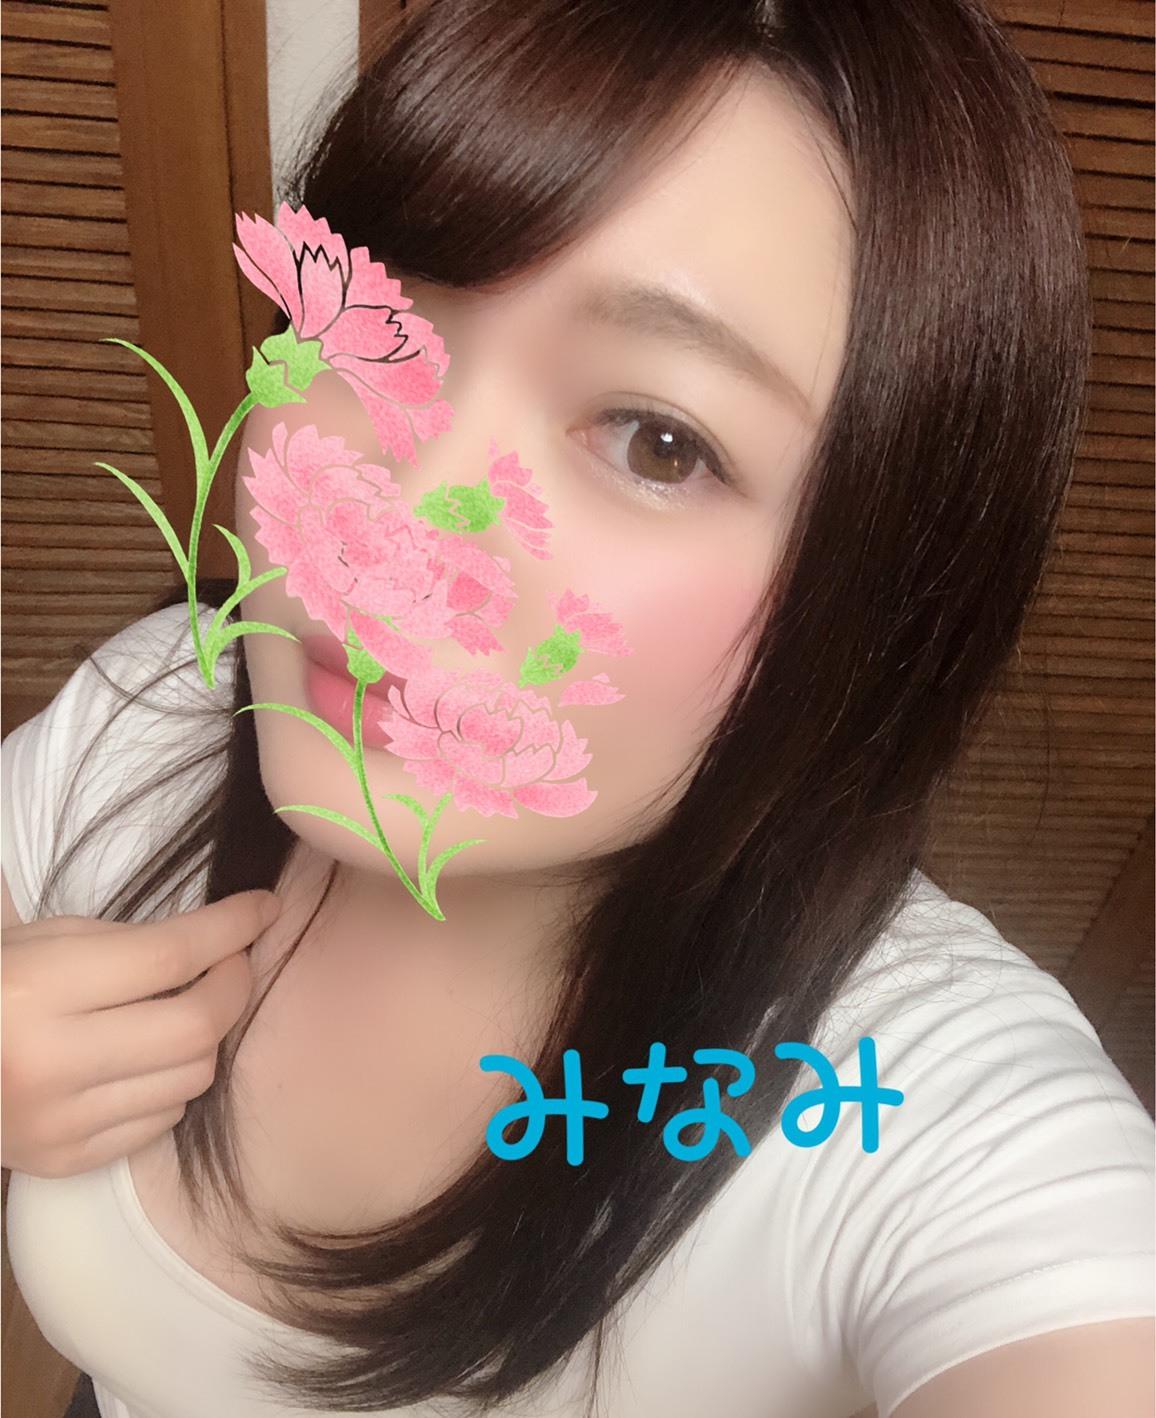 S__16179206.jpg